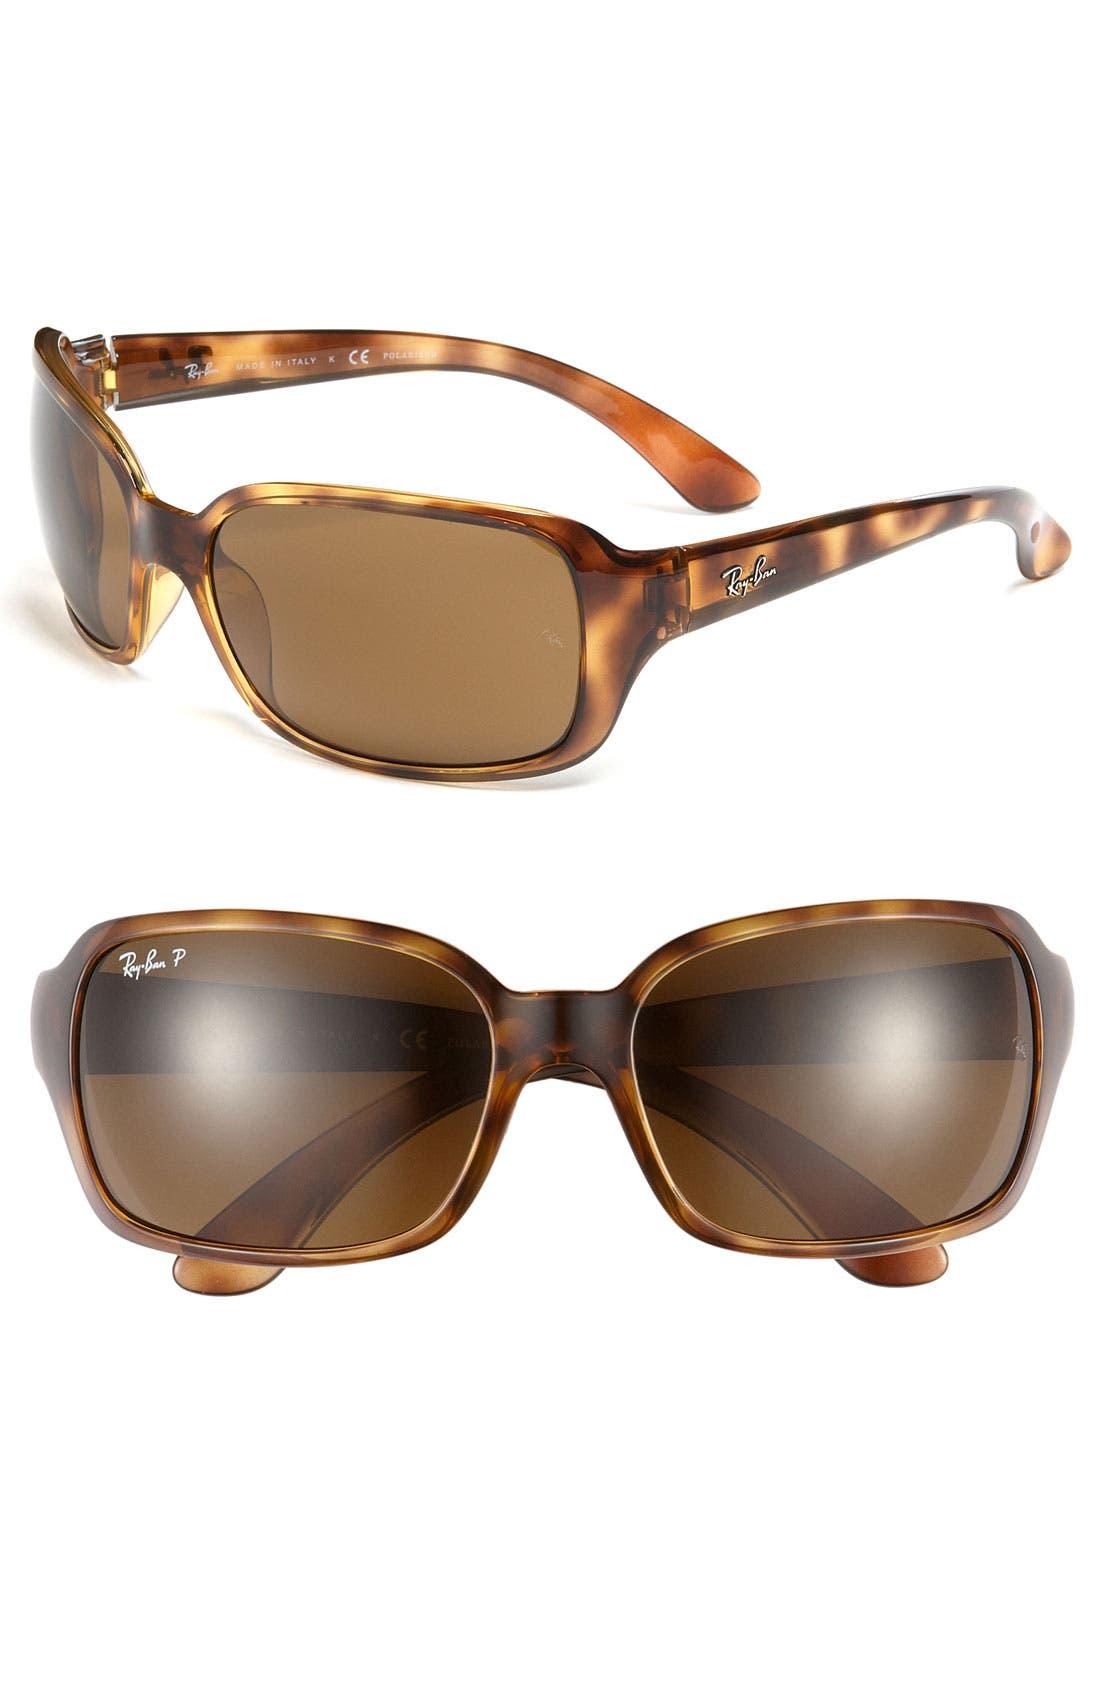 Main Image - Ray-Ban 'Big Glamour' 60mm Polarized Sunglasses